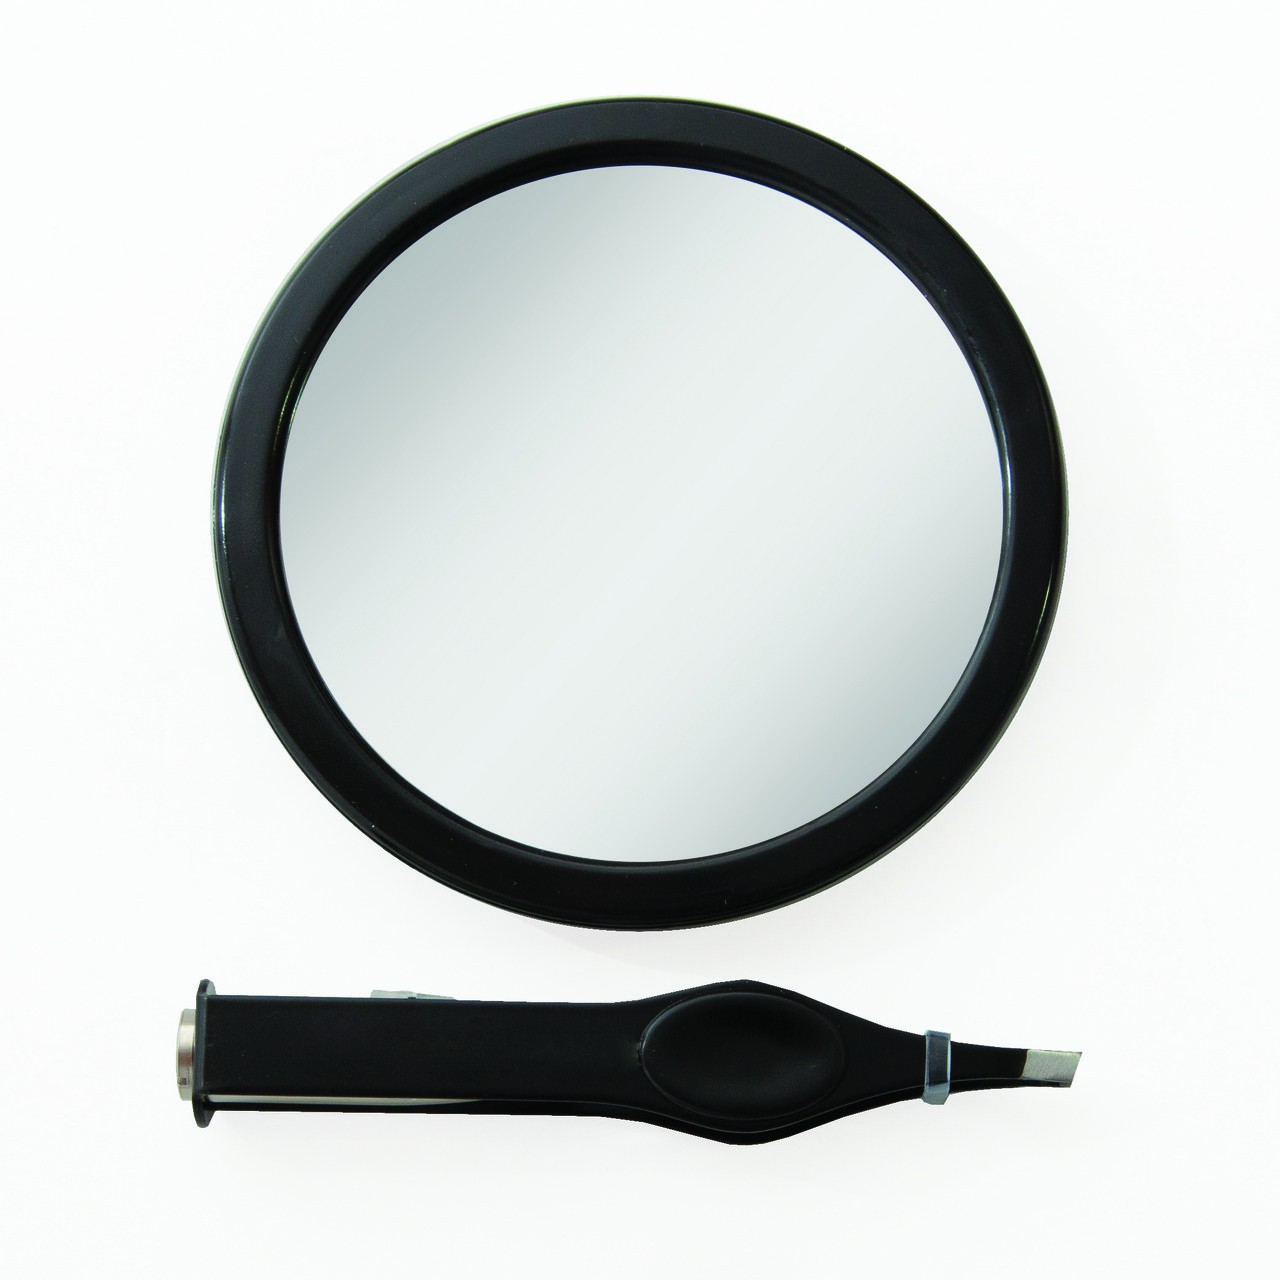 Twistmirror Miroir Intelligent Grossissant 10x Couleur Bois